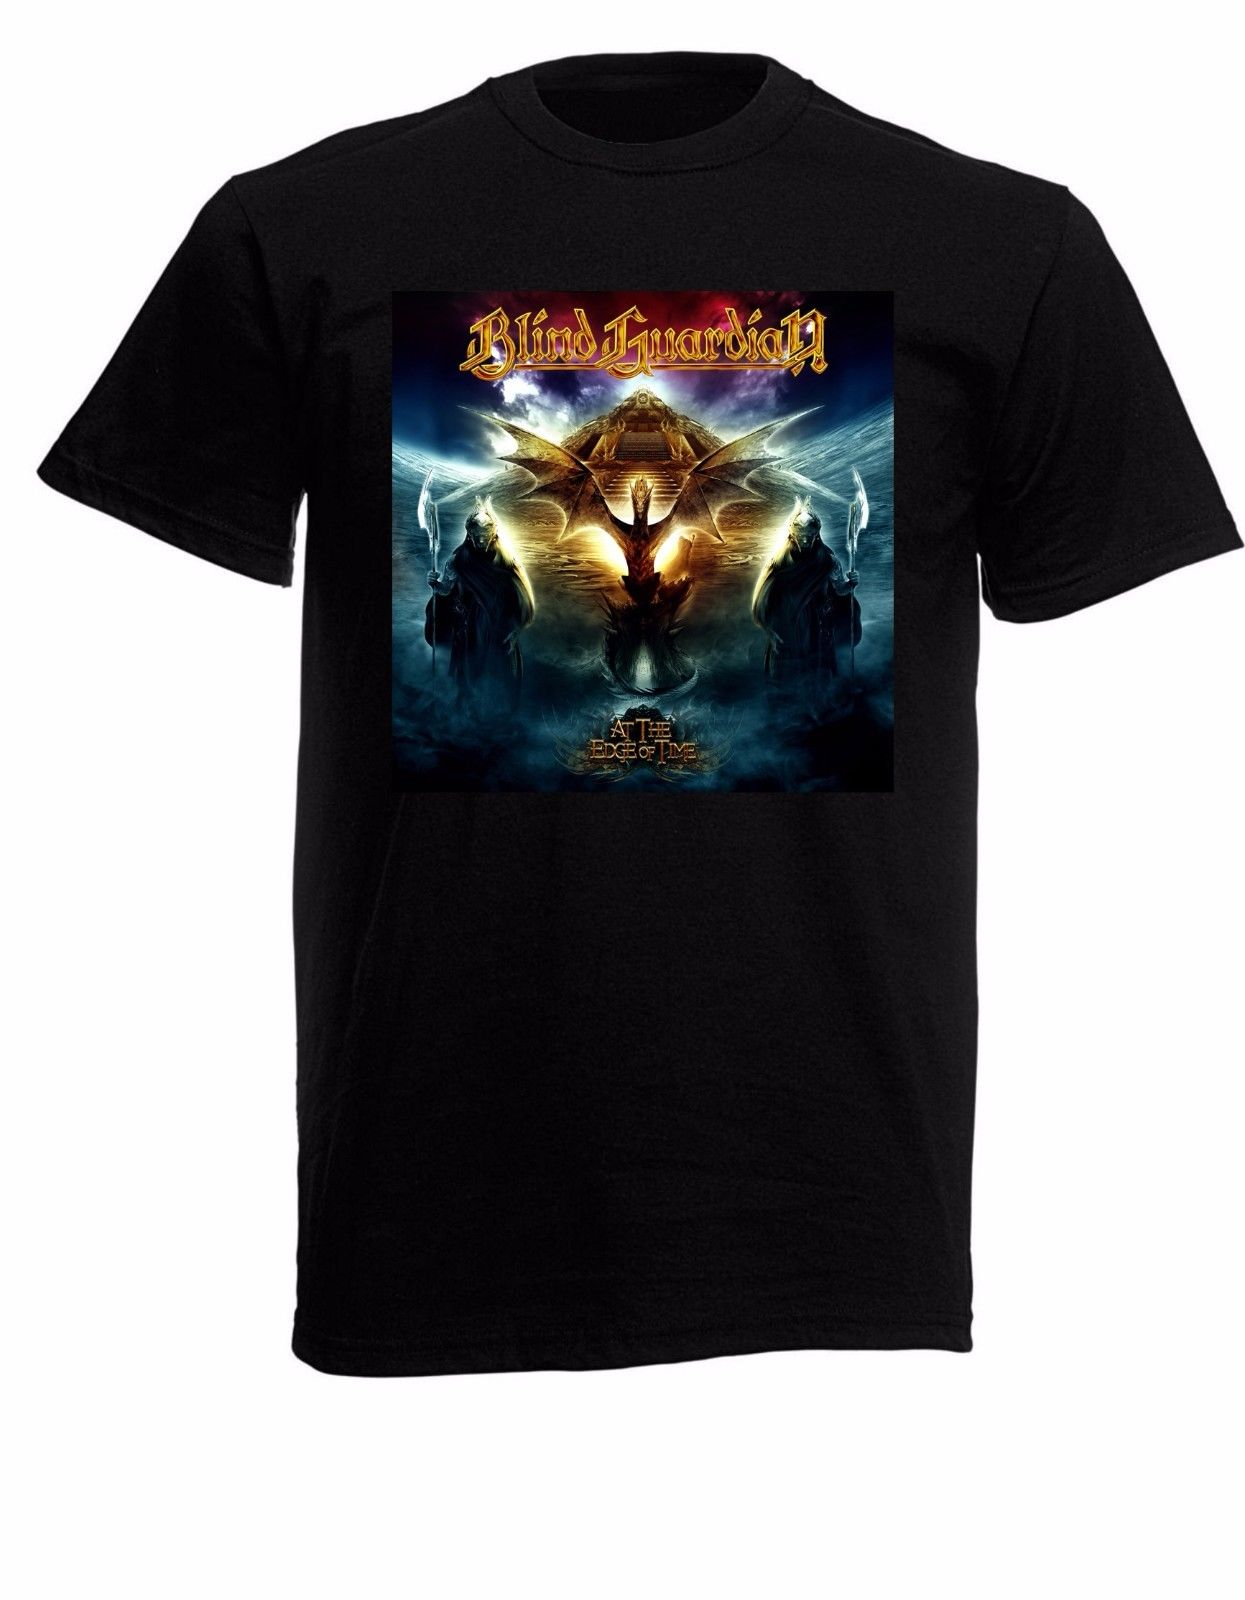 Blind Guardian 02 Mens Black Rock T-shirt NEW Sizes S-XXXL